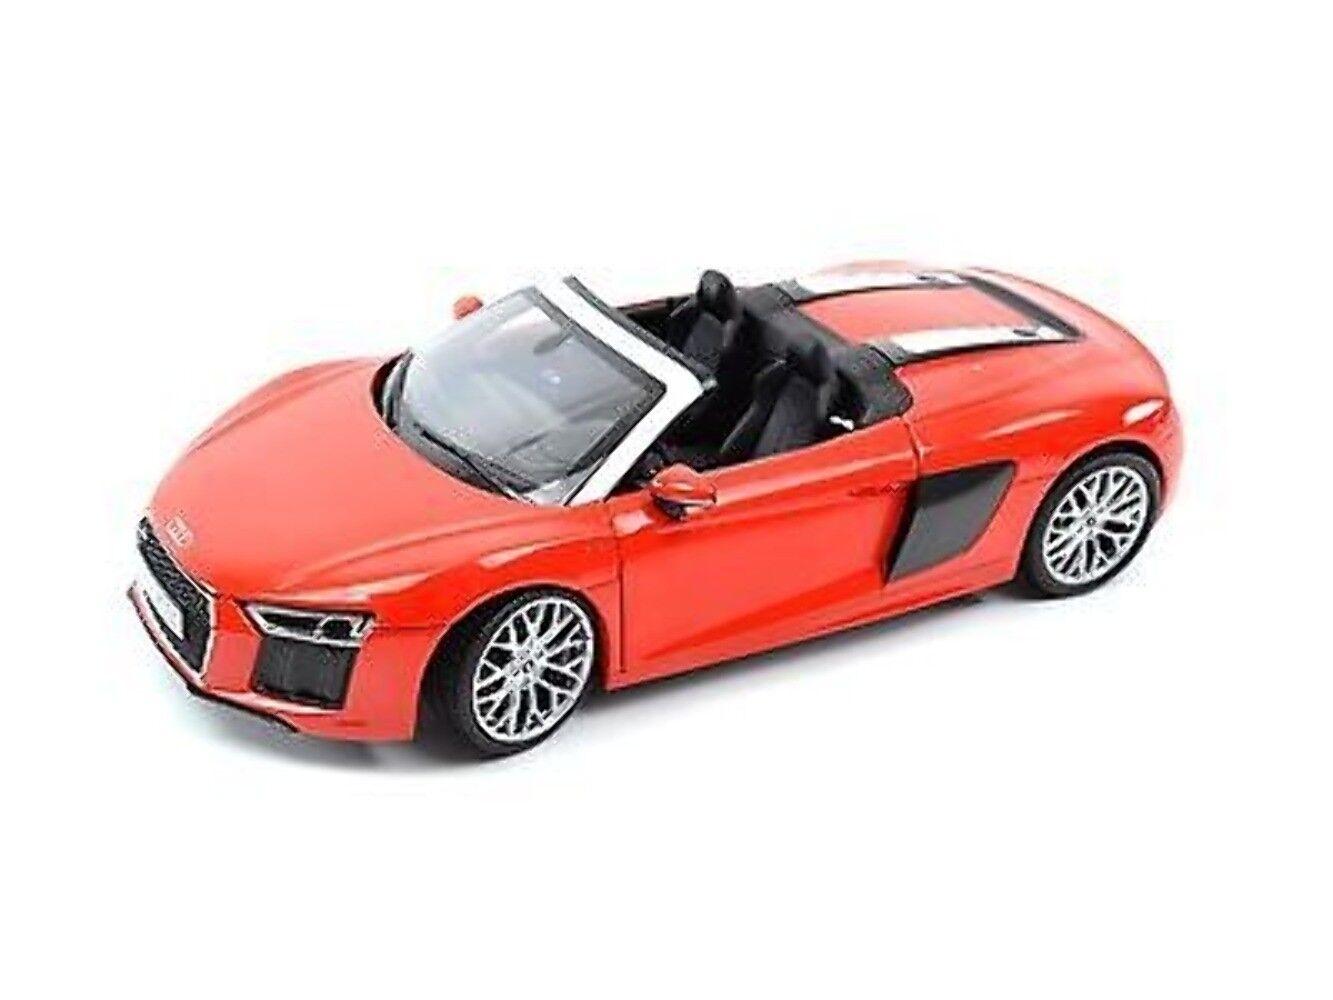 Audi R8 Spyder V10,Dynamitred,1 18 5011618552